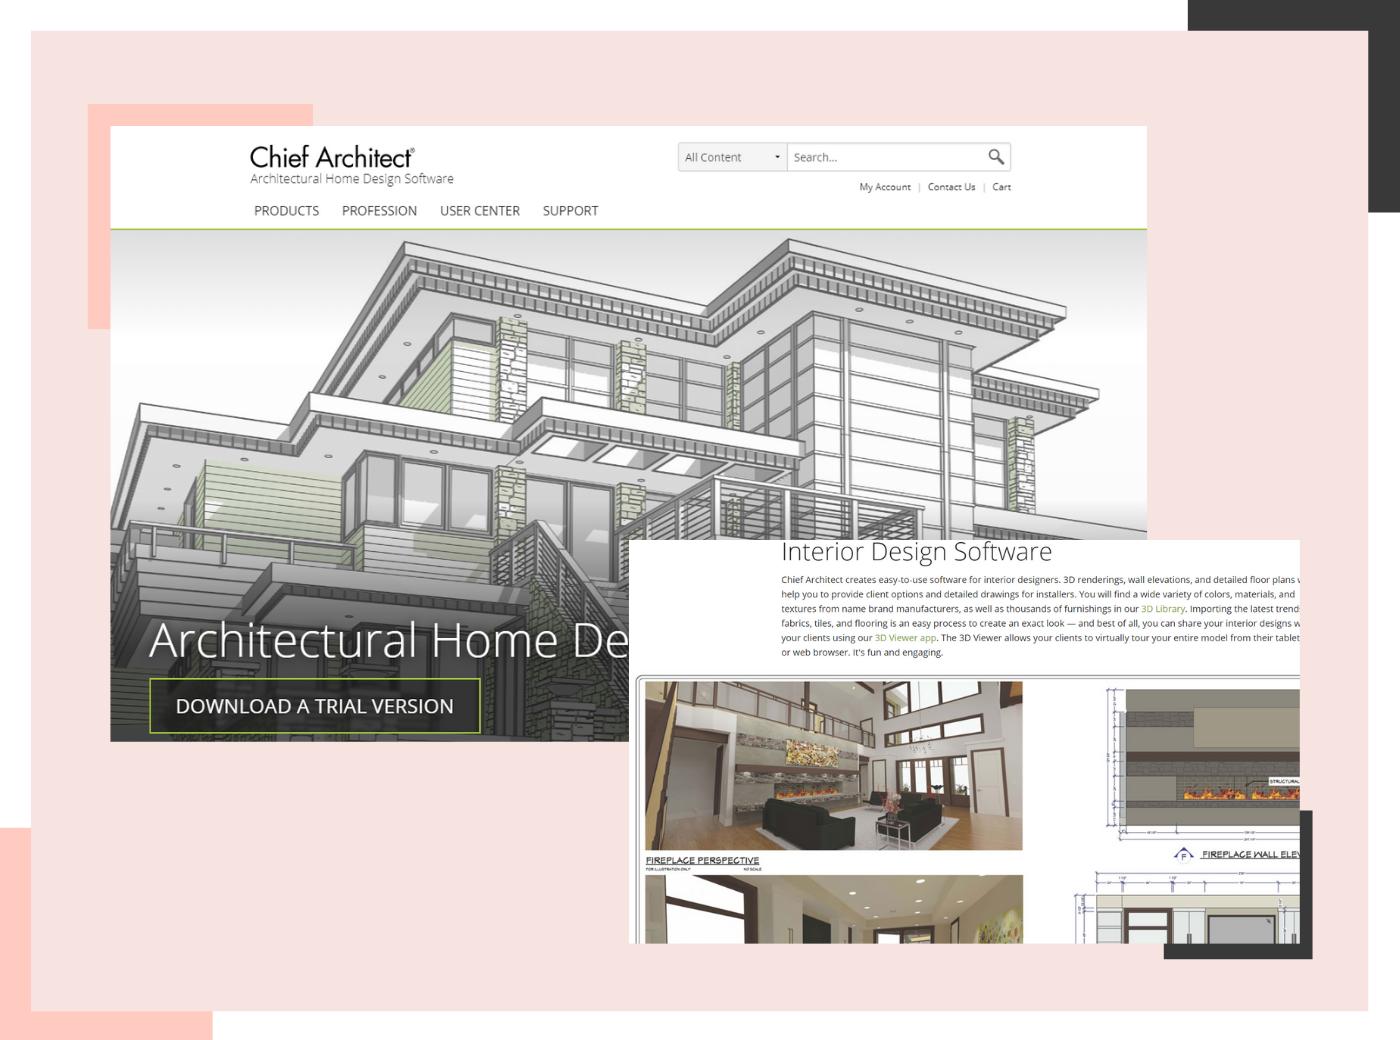 Chief Architect